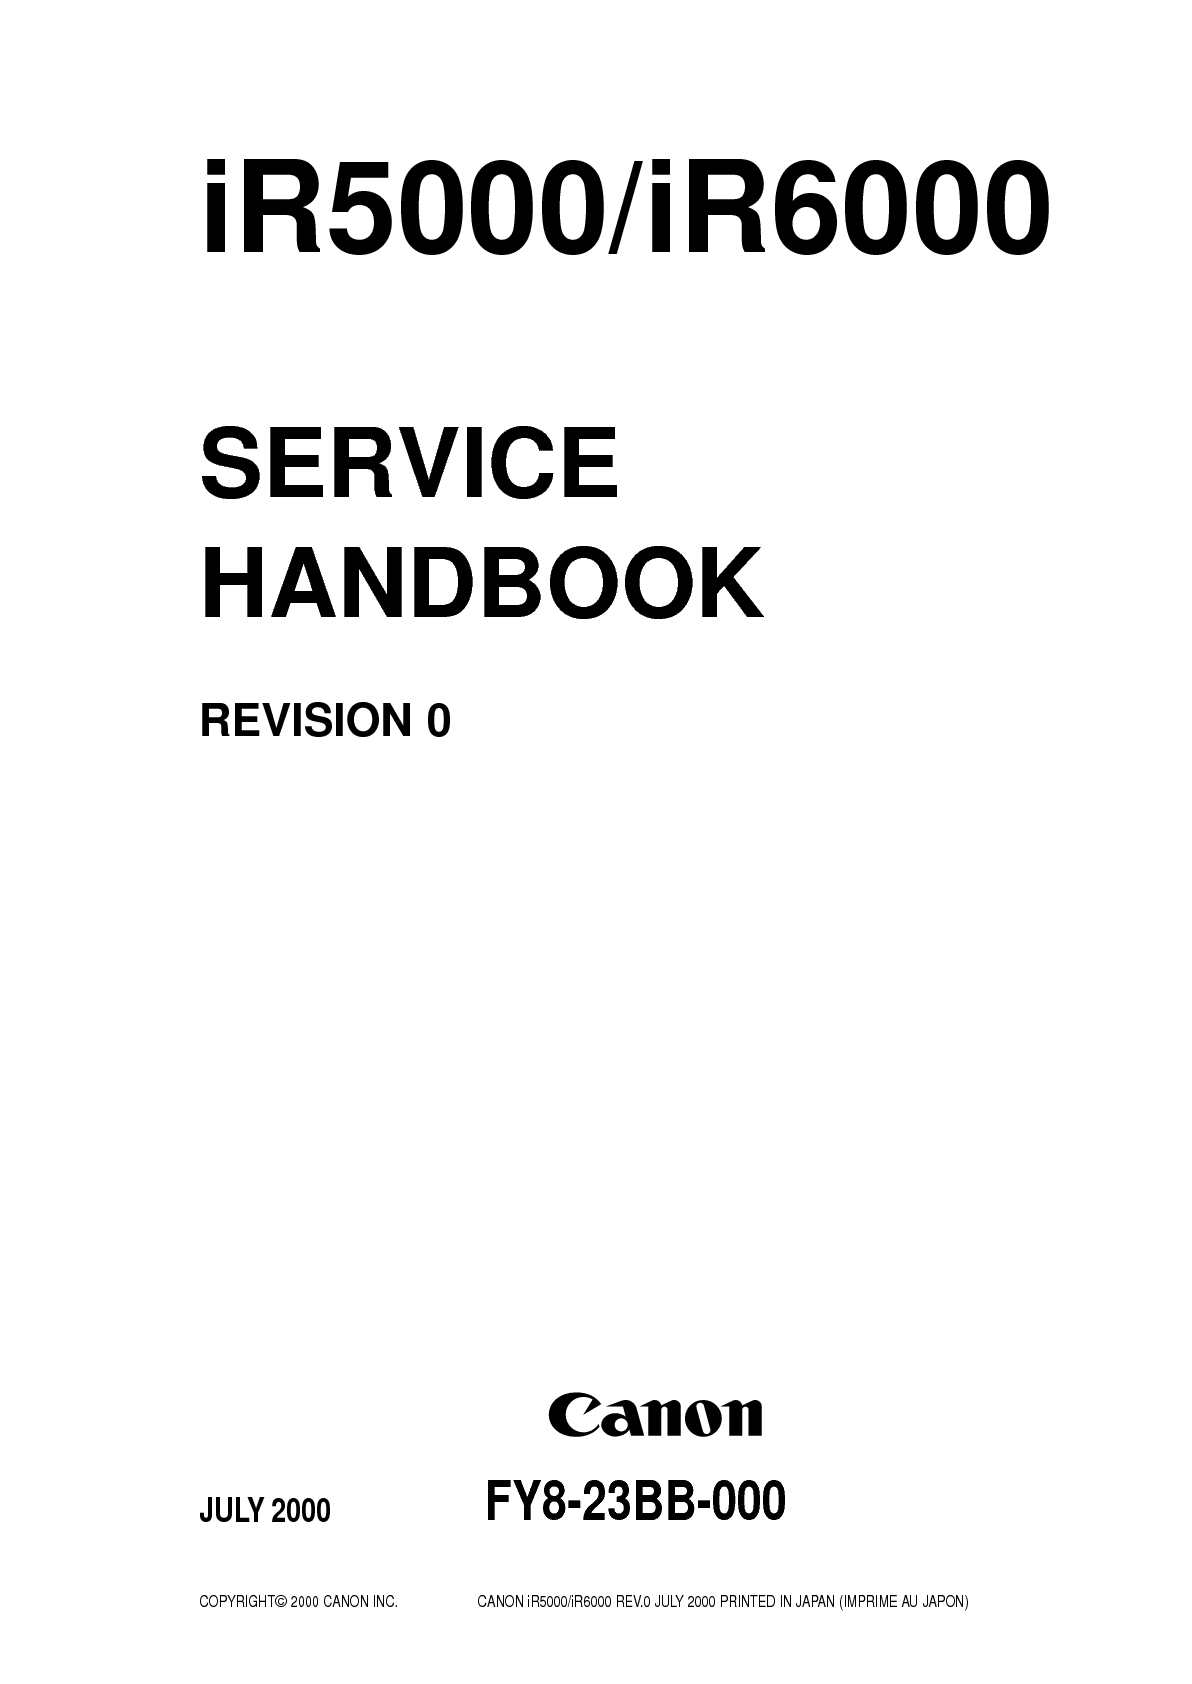 Calamo Imagerunner Ir5000 Ir6000 Service Handbook Dvc 2000 Positioner Wiring Diagram